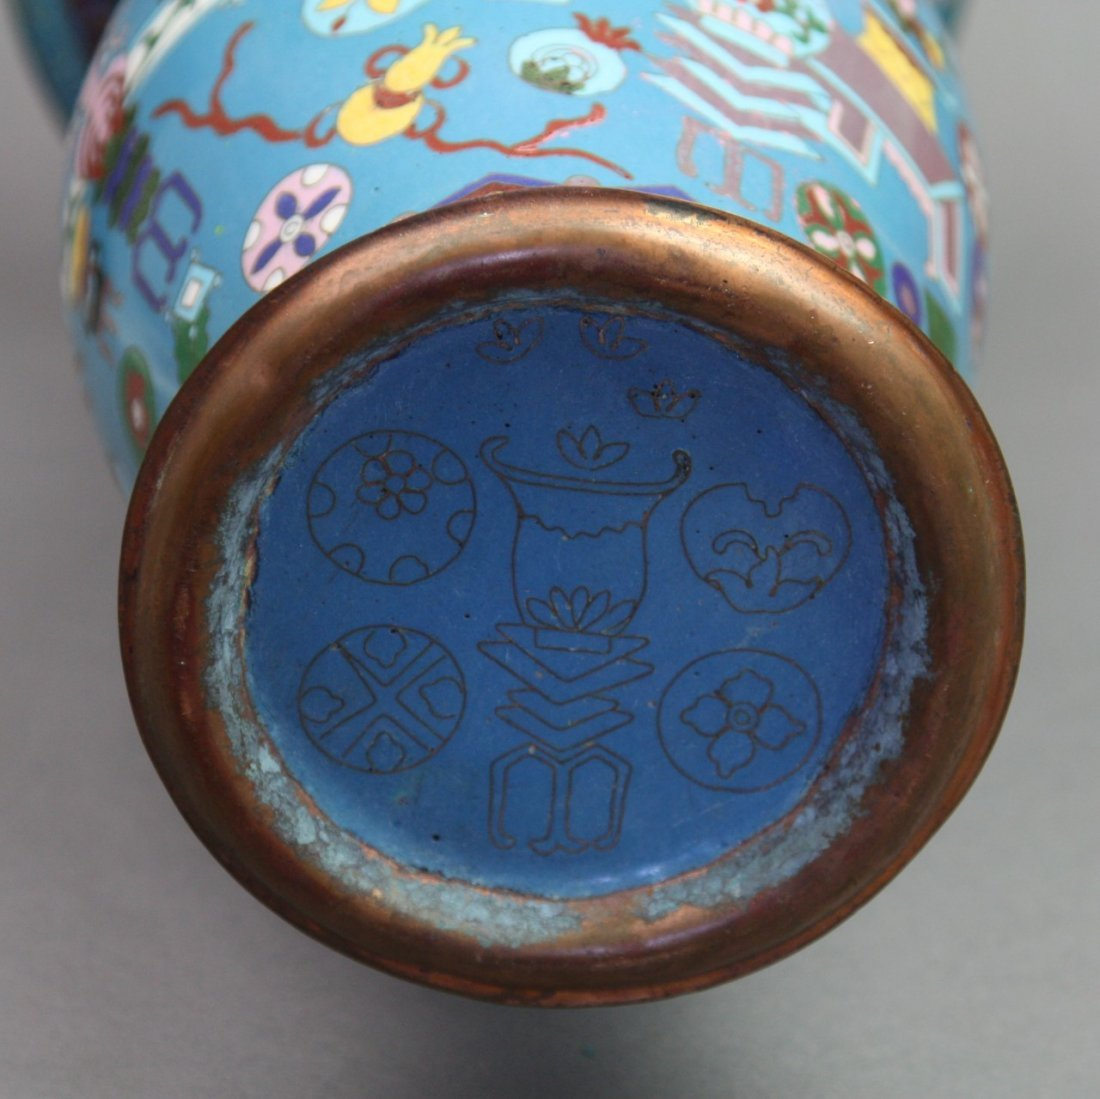 326: Massive Vintage Chinese Cloisonne Yen Yen Vase - 6